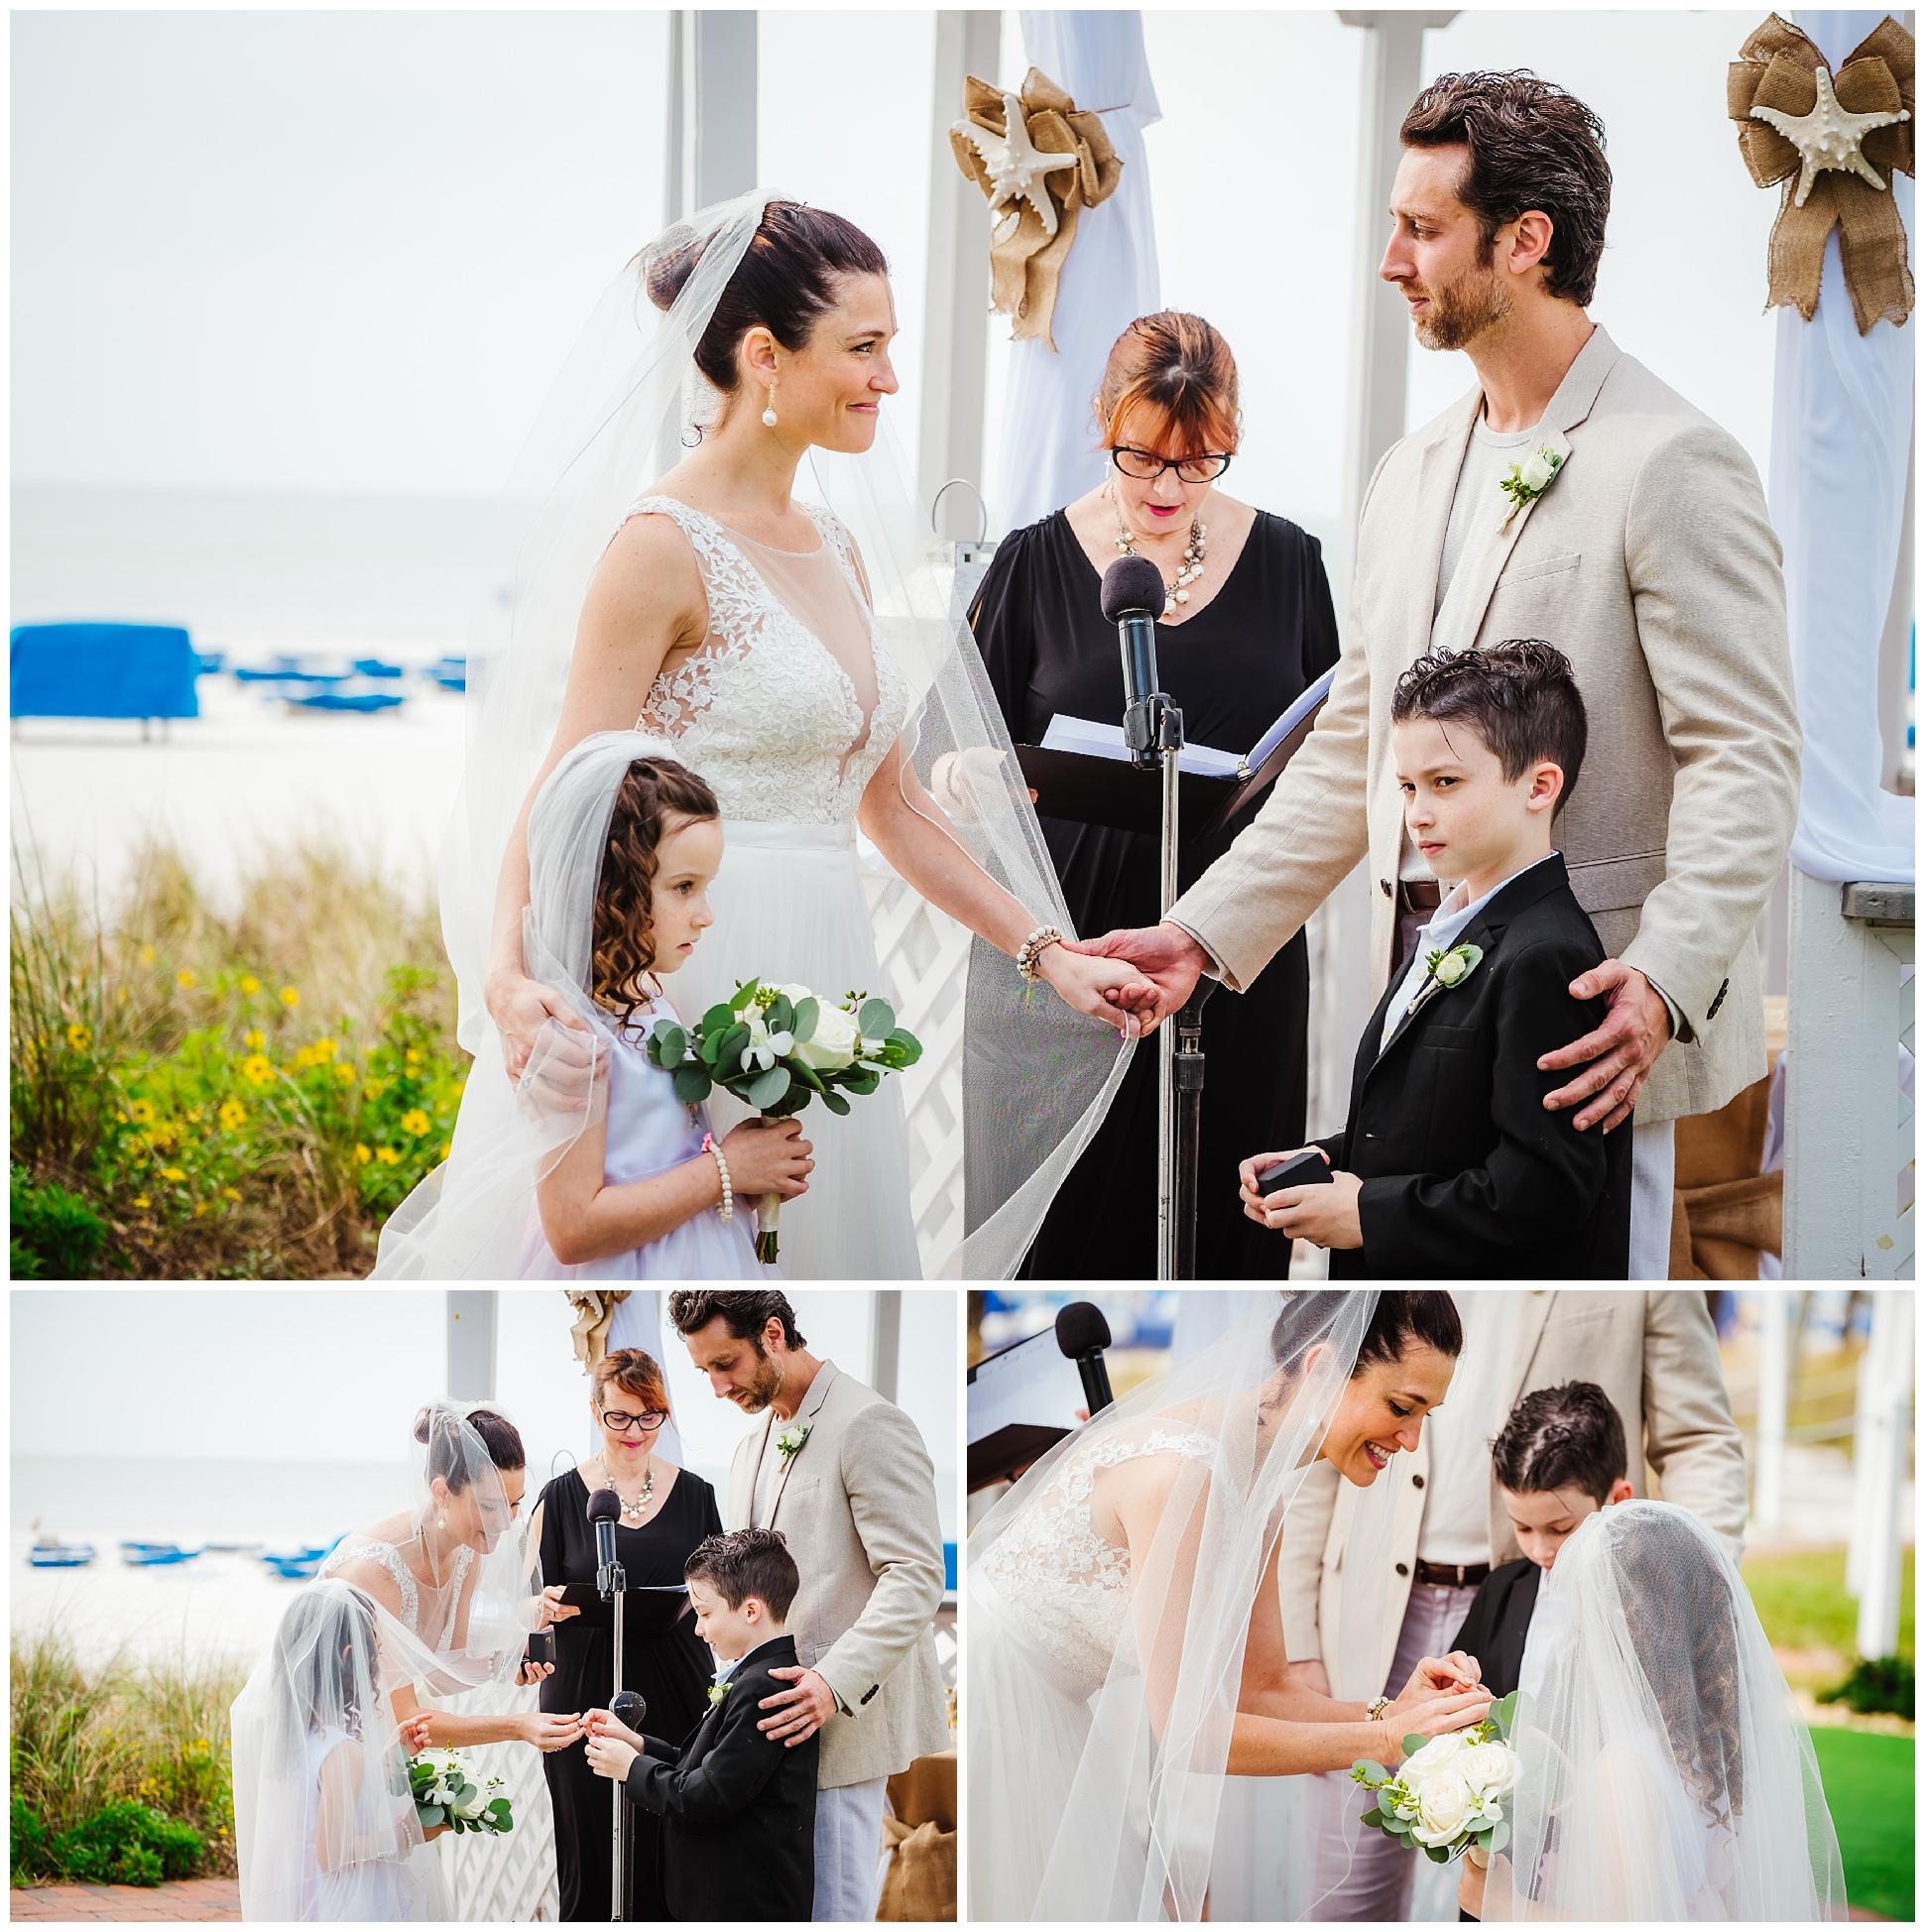 tampa-wedding-photographer-tradewinds-beach-family-elopement_0089.jpg